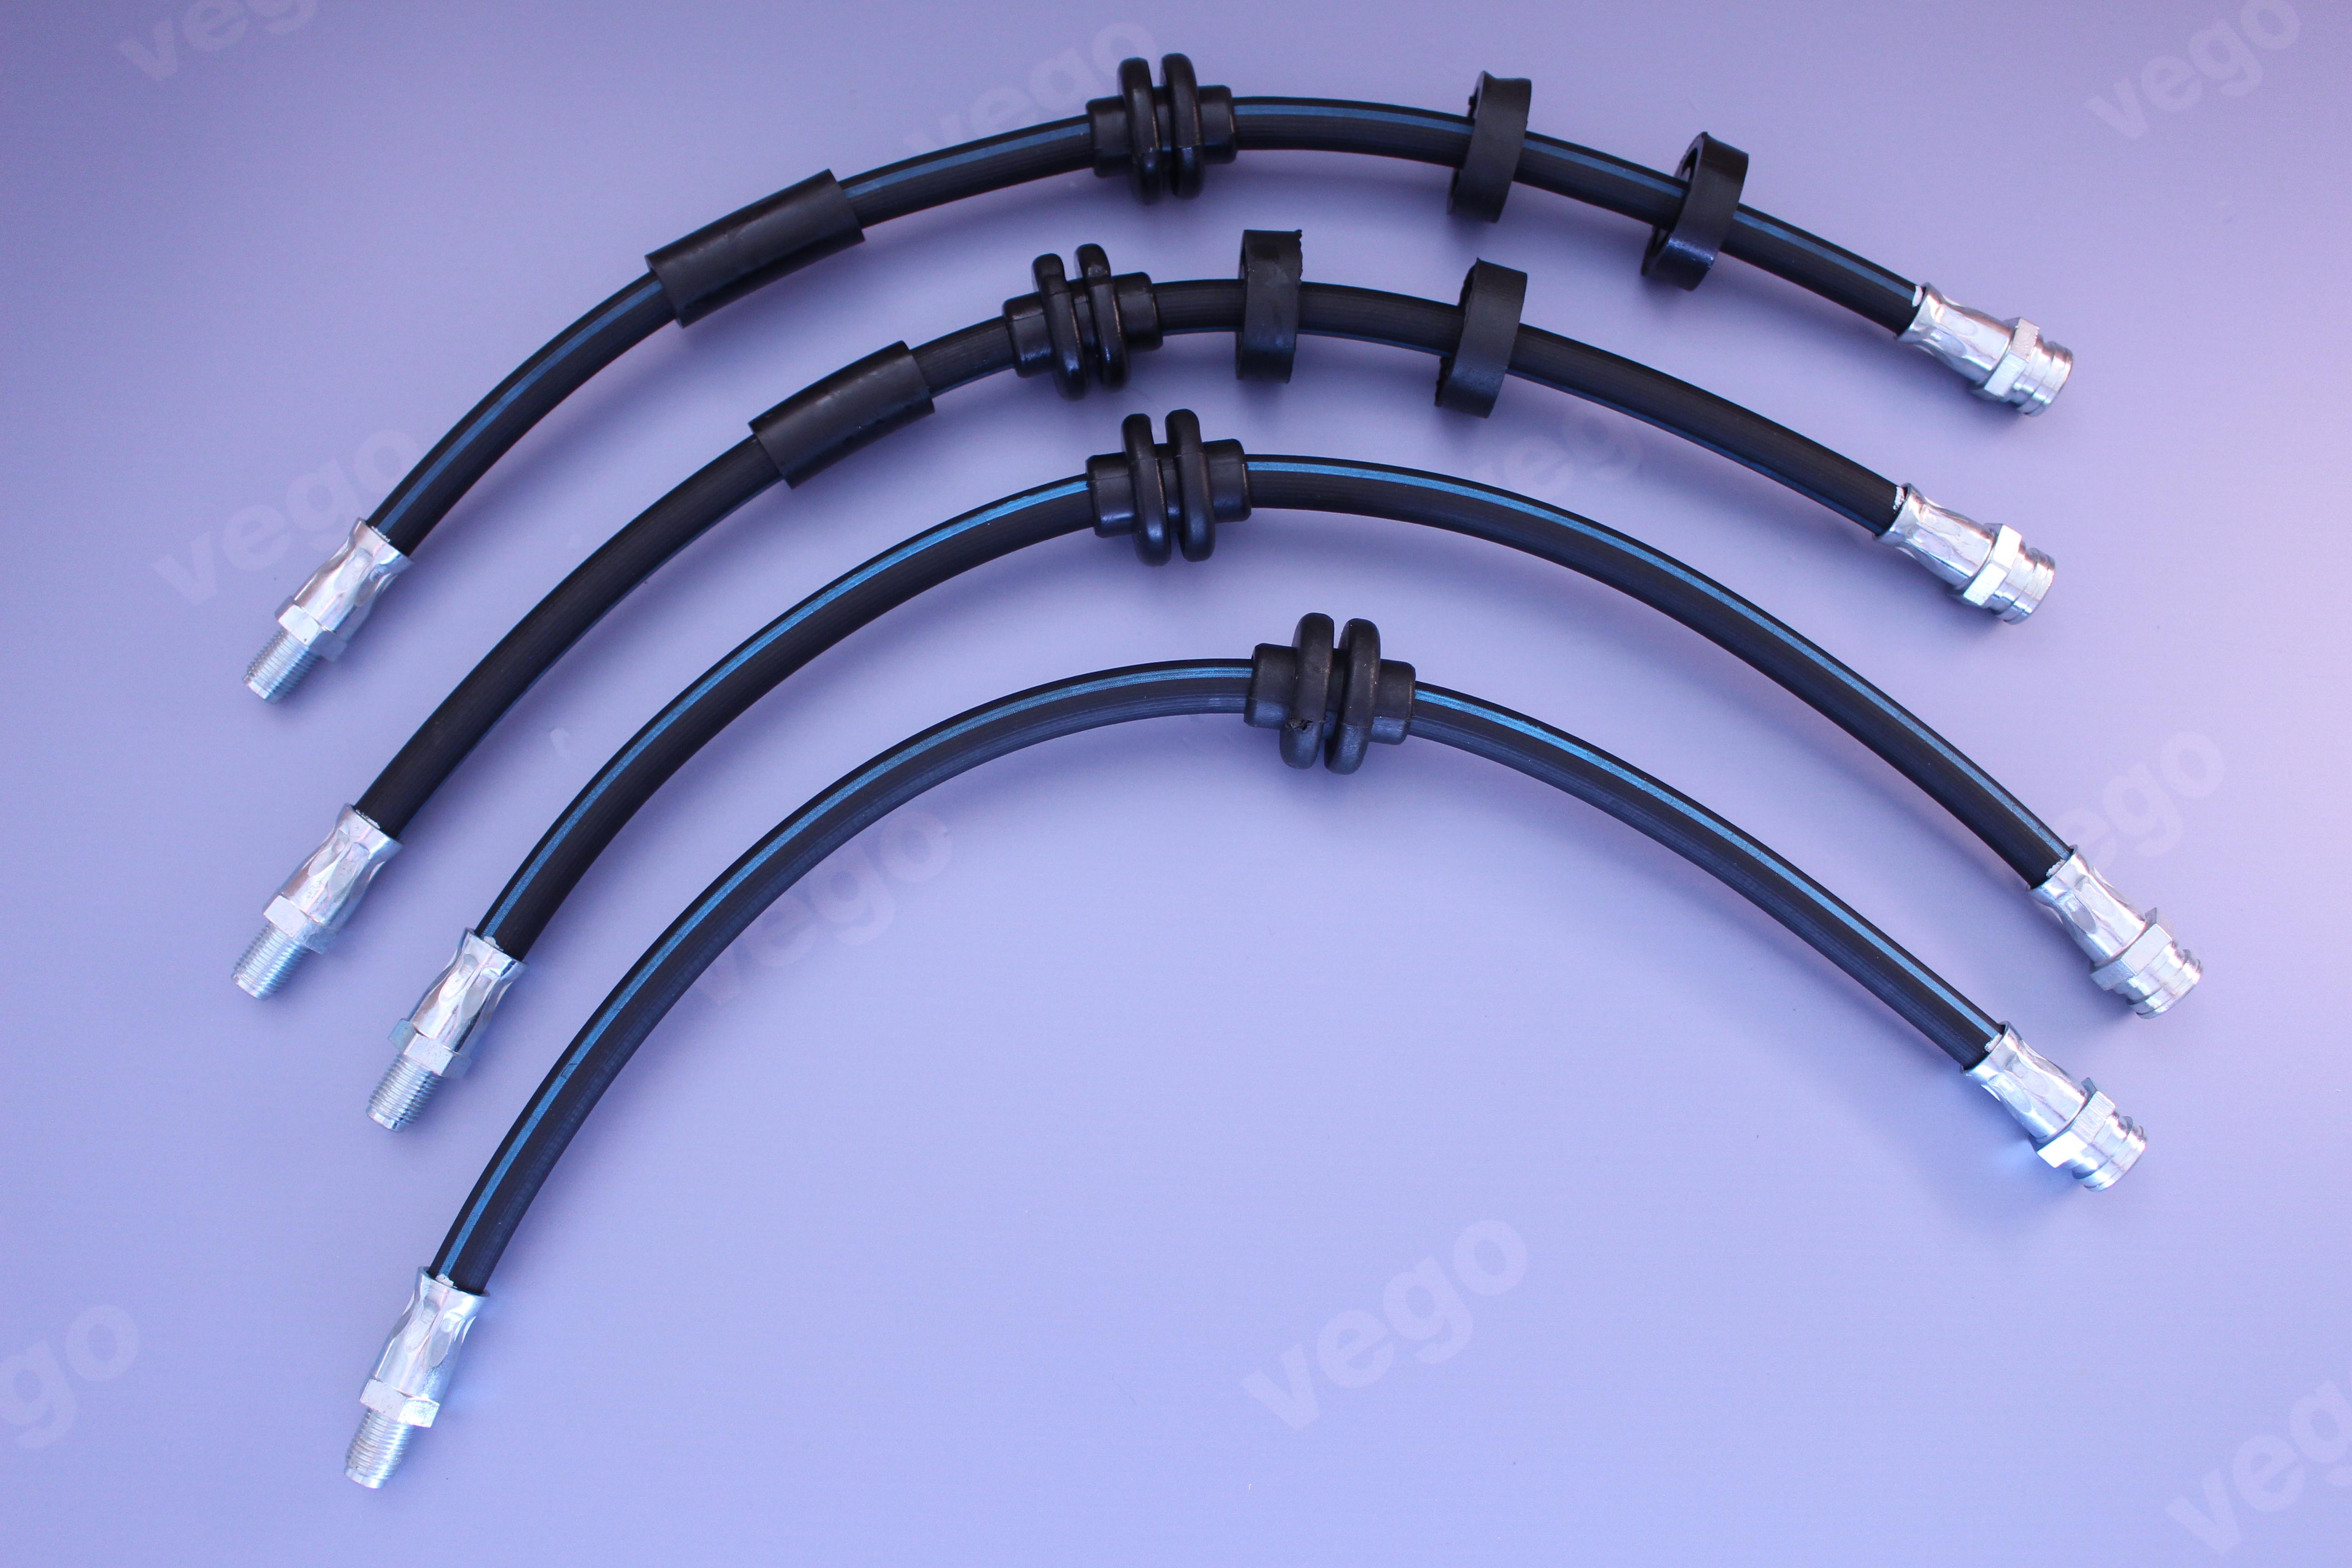 2x Bremsschlauch Bremsleitung Bremsschl/äuche 250 mm hinten,